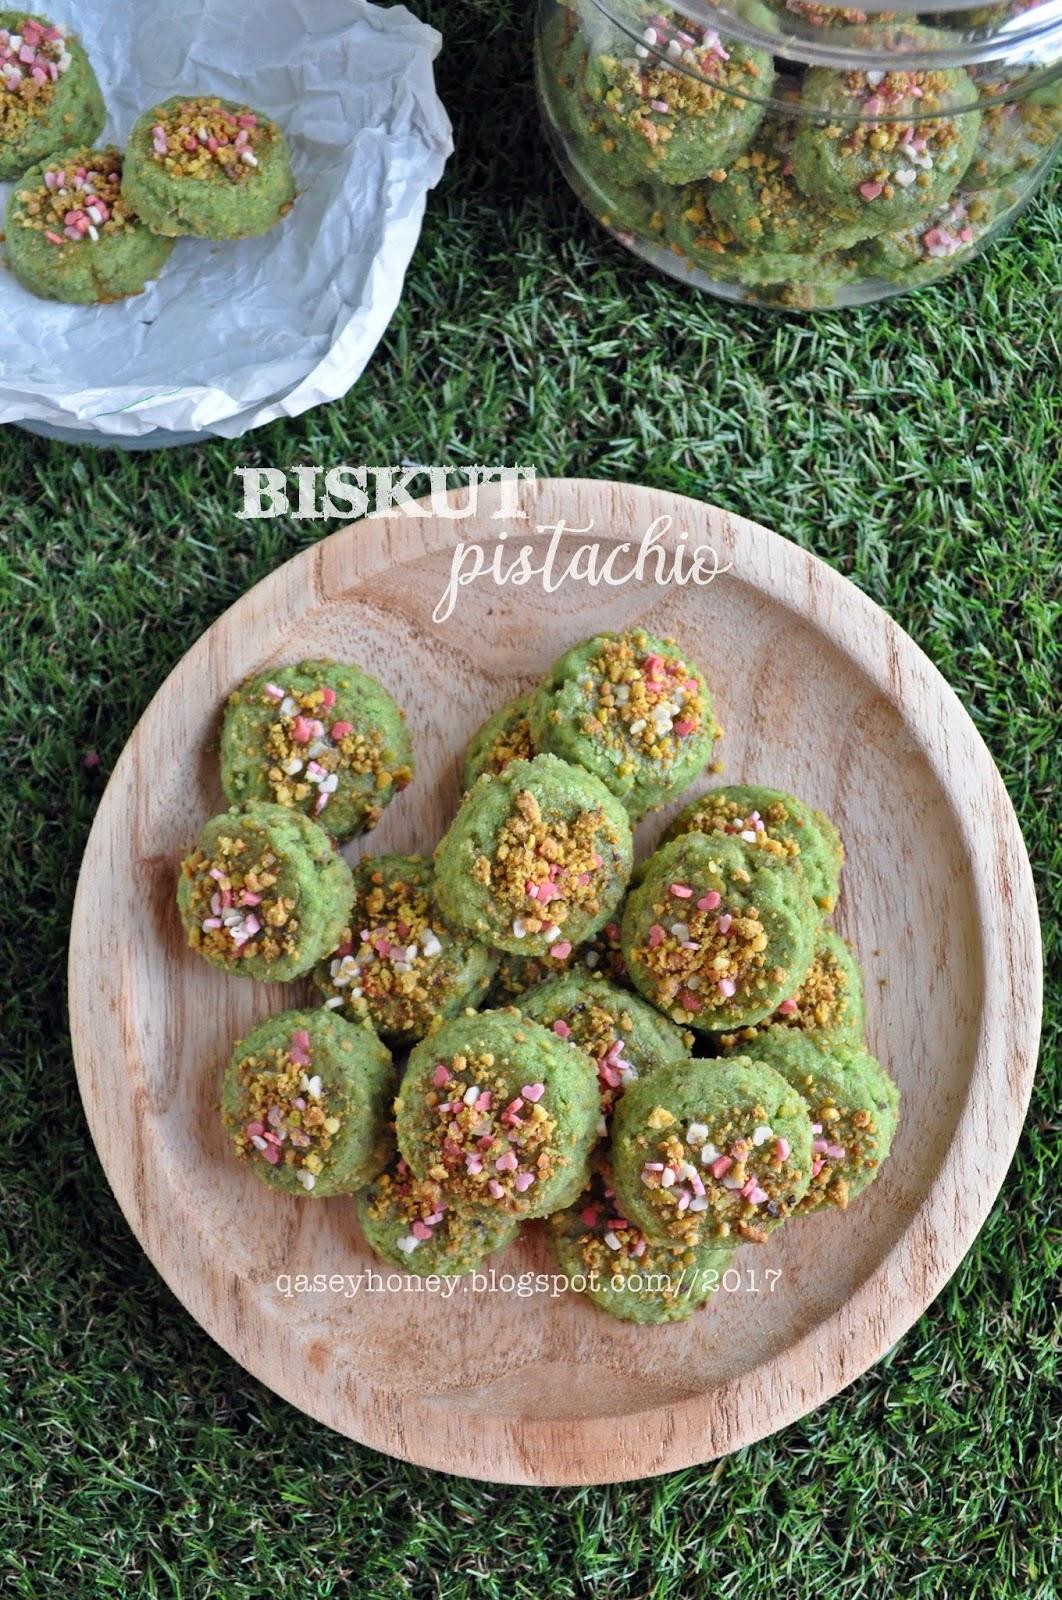 BISKUT PISTACHIO   QASEY HONEY   Kacang pistachio, Resep masakan, Kue kering